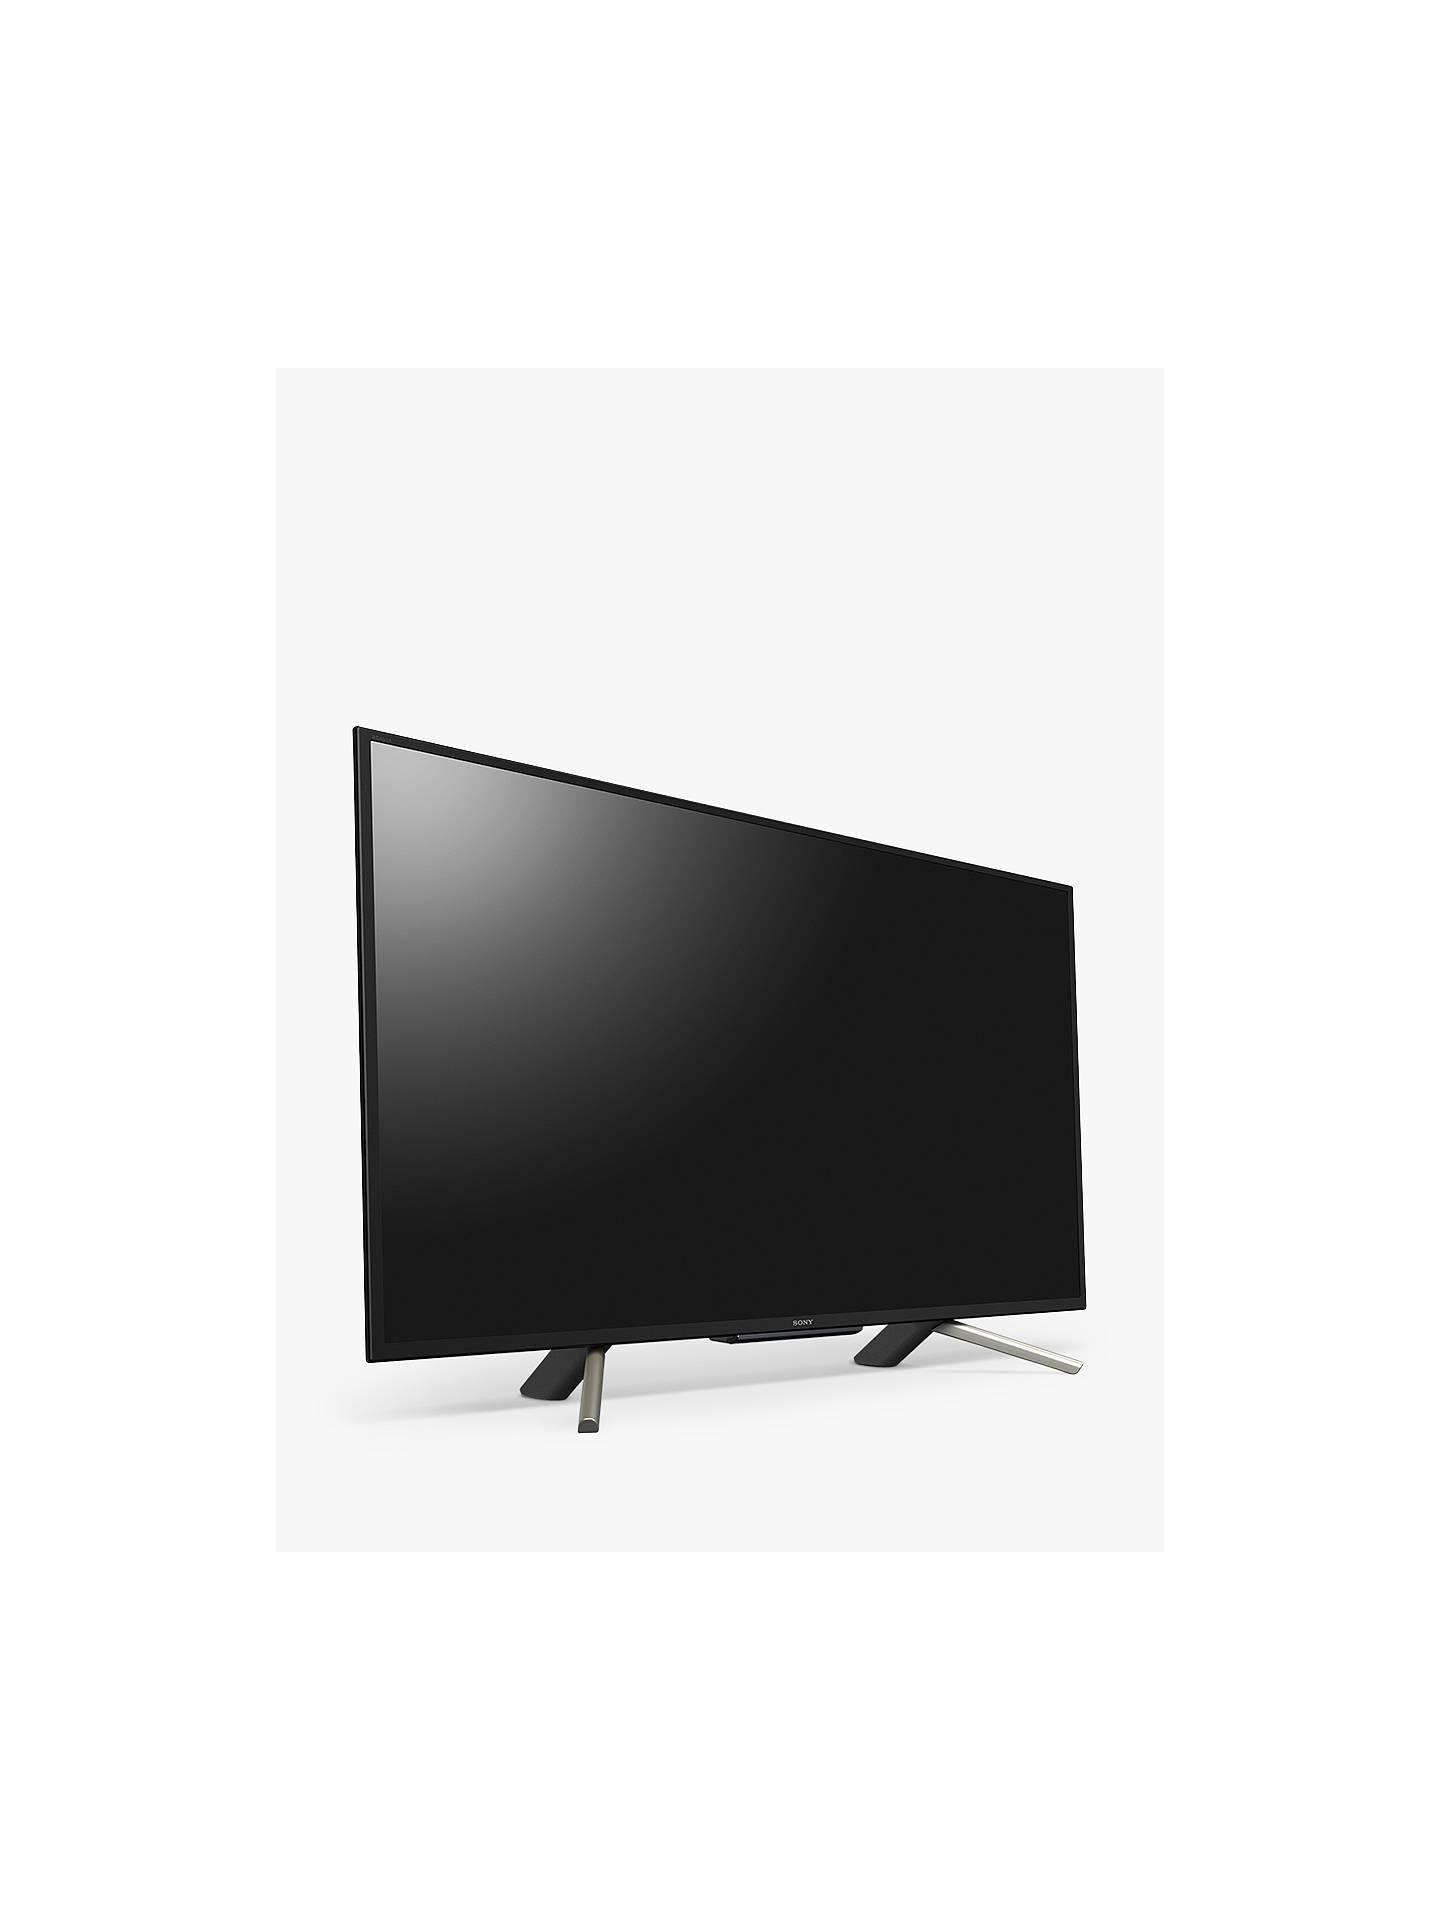 Sony Bravia KDL43WF663 LED HDR Full HD 1080p Smart TV, 43